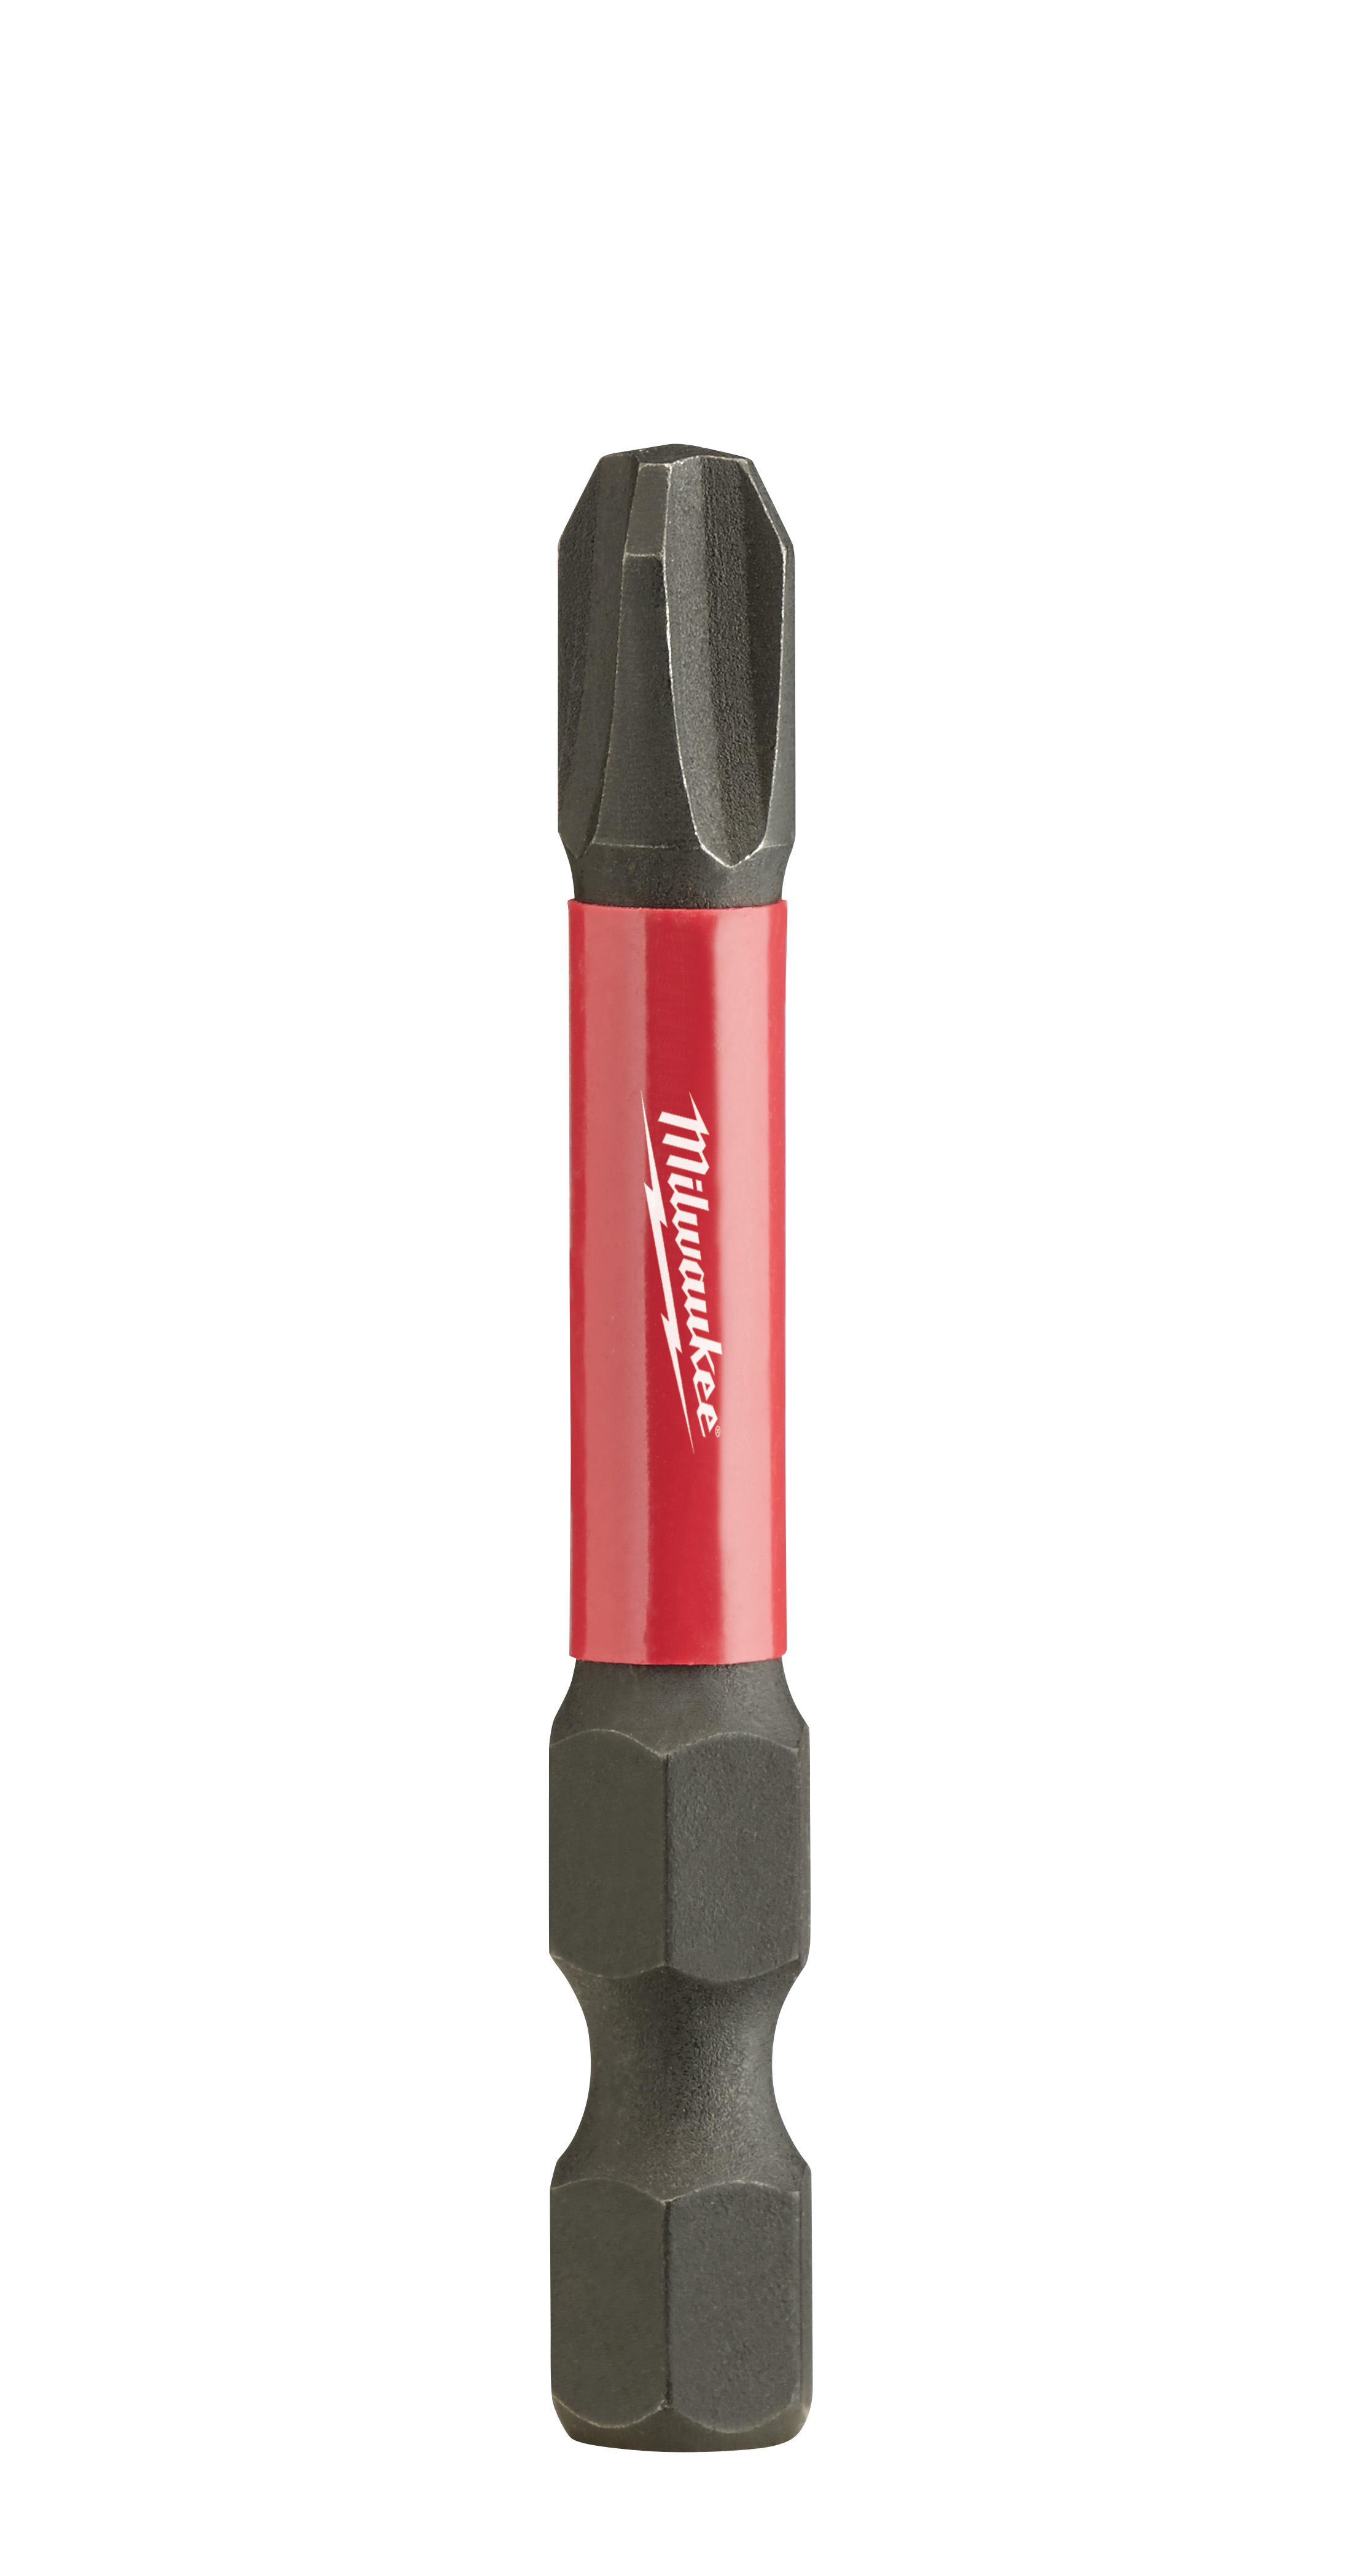 Milwaukee® SHOCKWAVE™ 48-32-4263 Impact Driver Bit, #3 Phillips® Point, 2 in OAL, 1/4 in, Custom Alloy76™ Steel